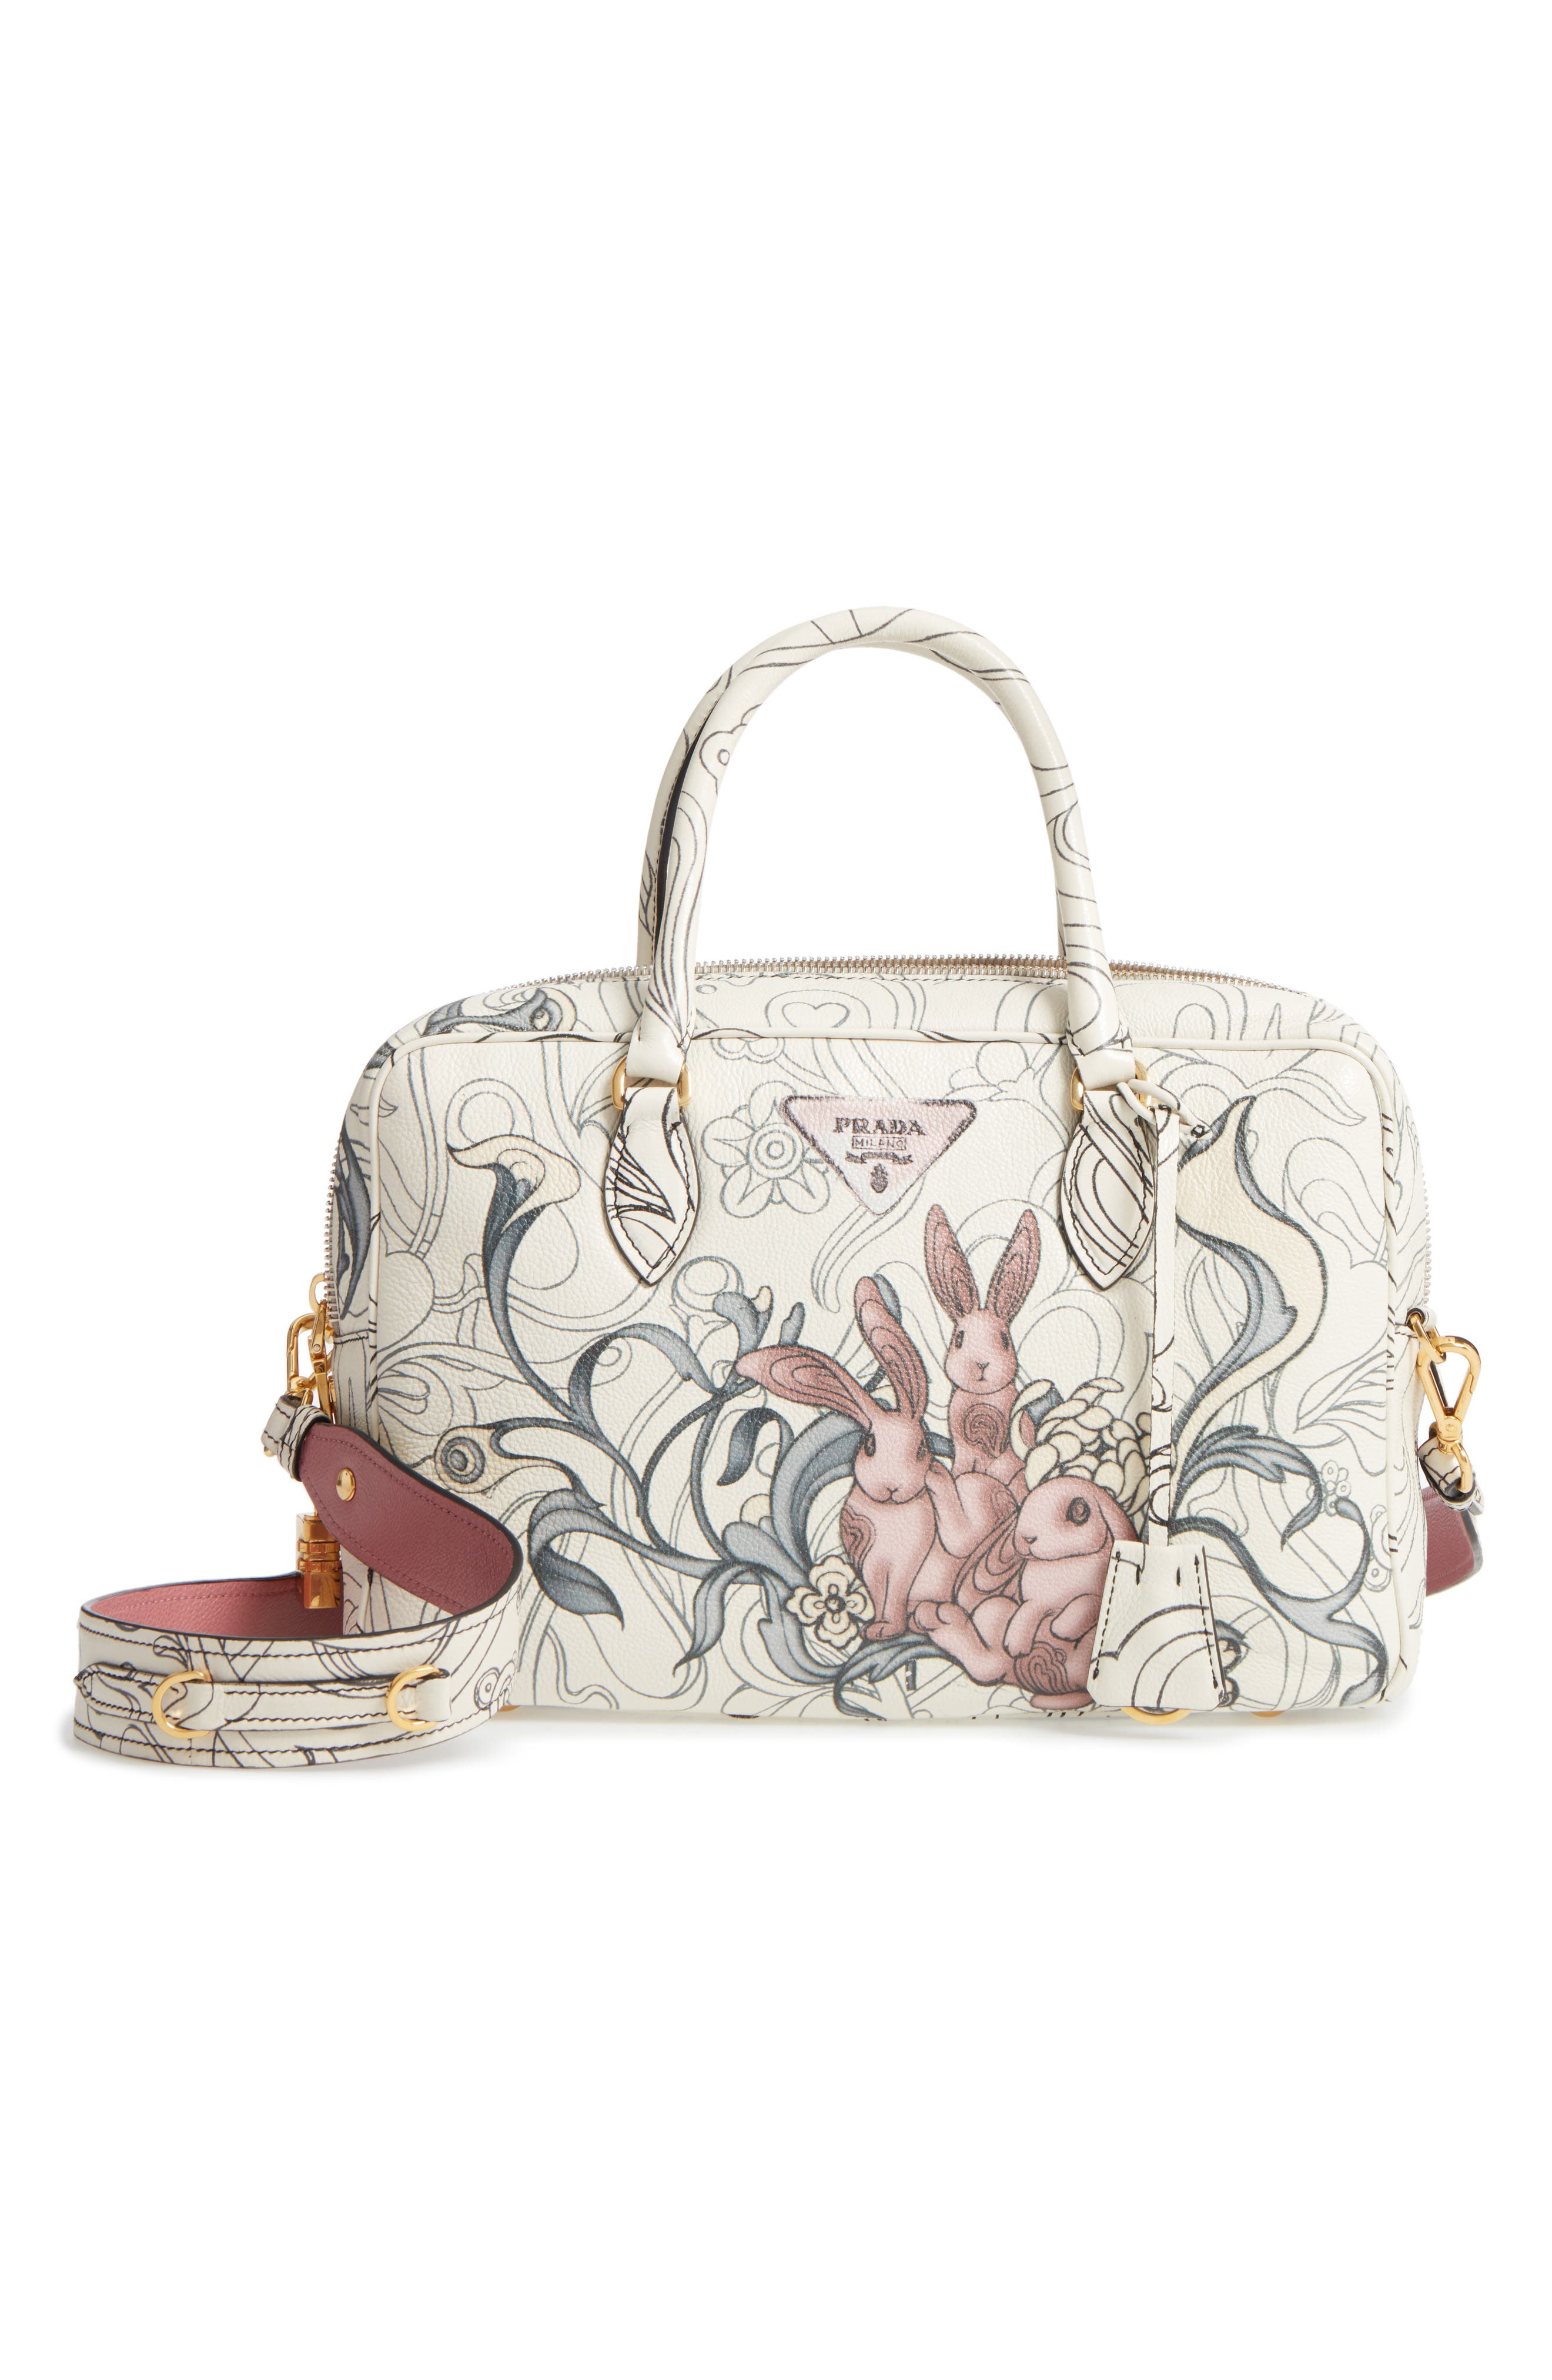 Glace Calfskin Rabbit Bowler Bag,                             Main thumbnail 1, color,                             100